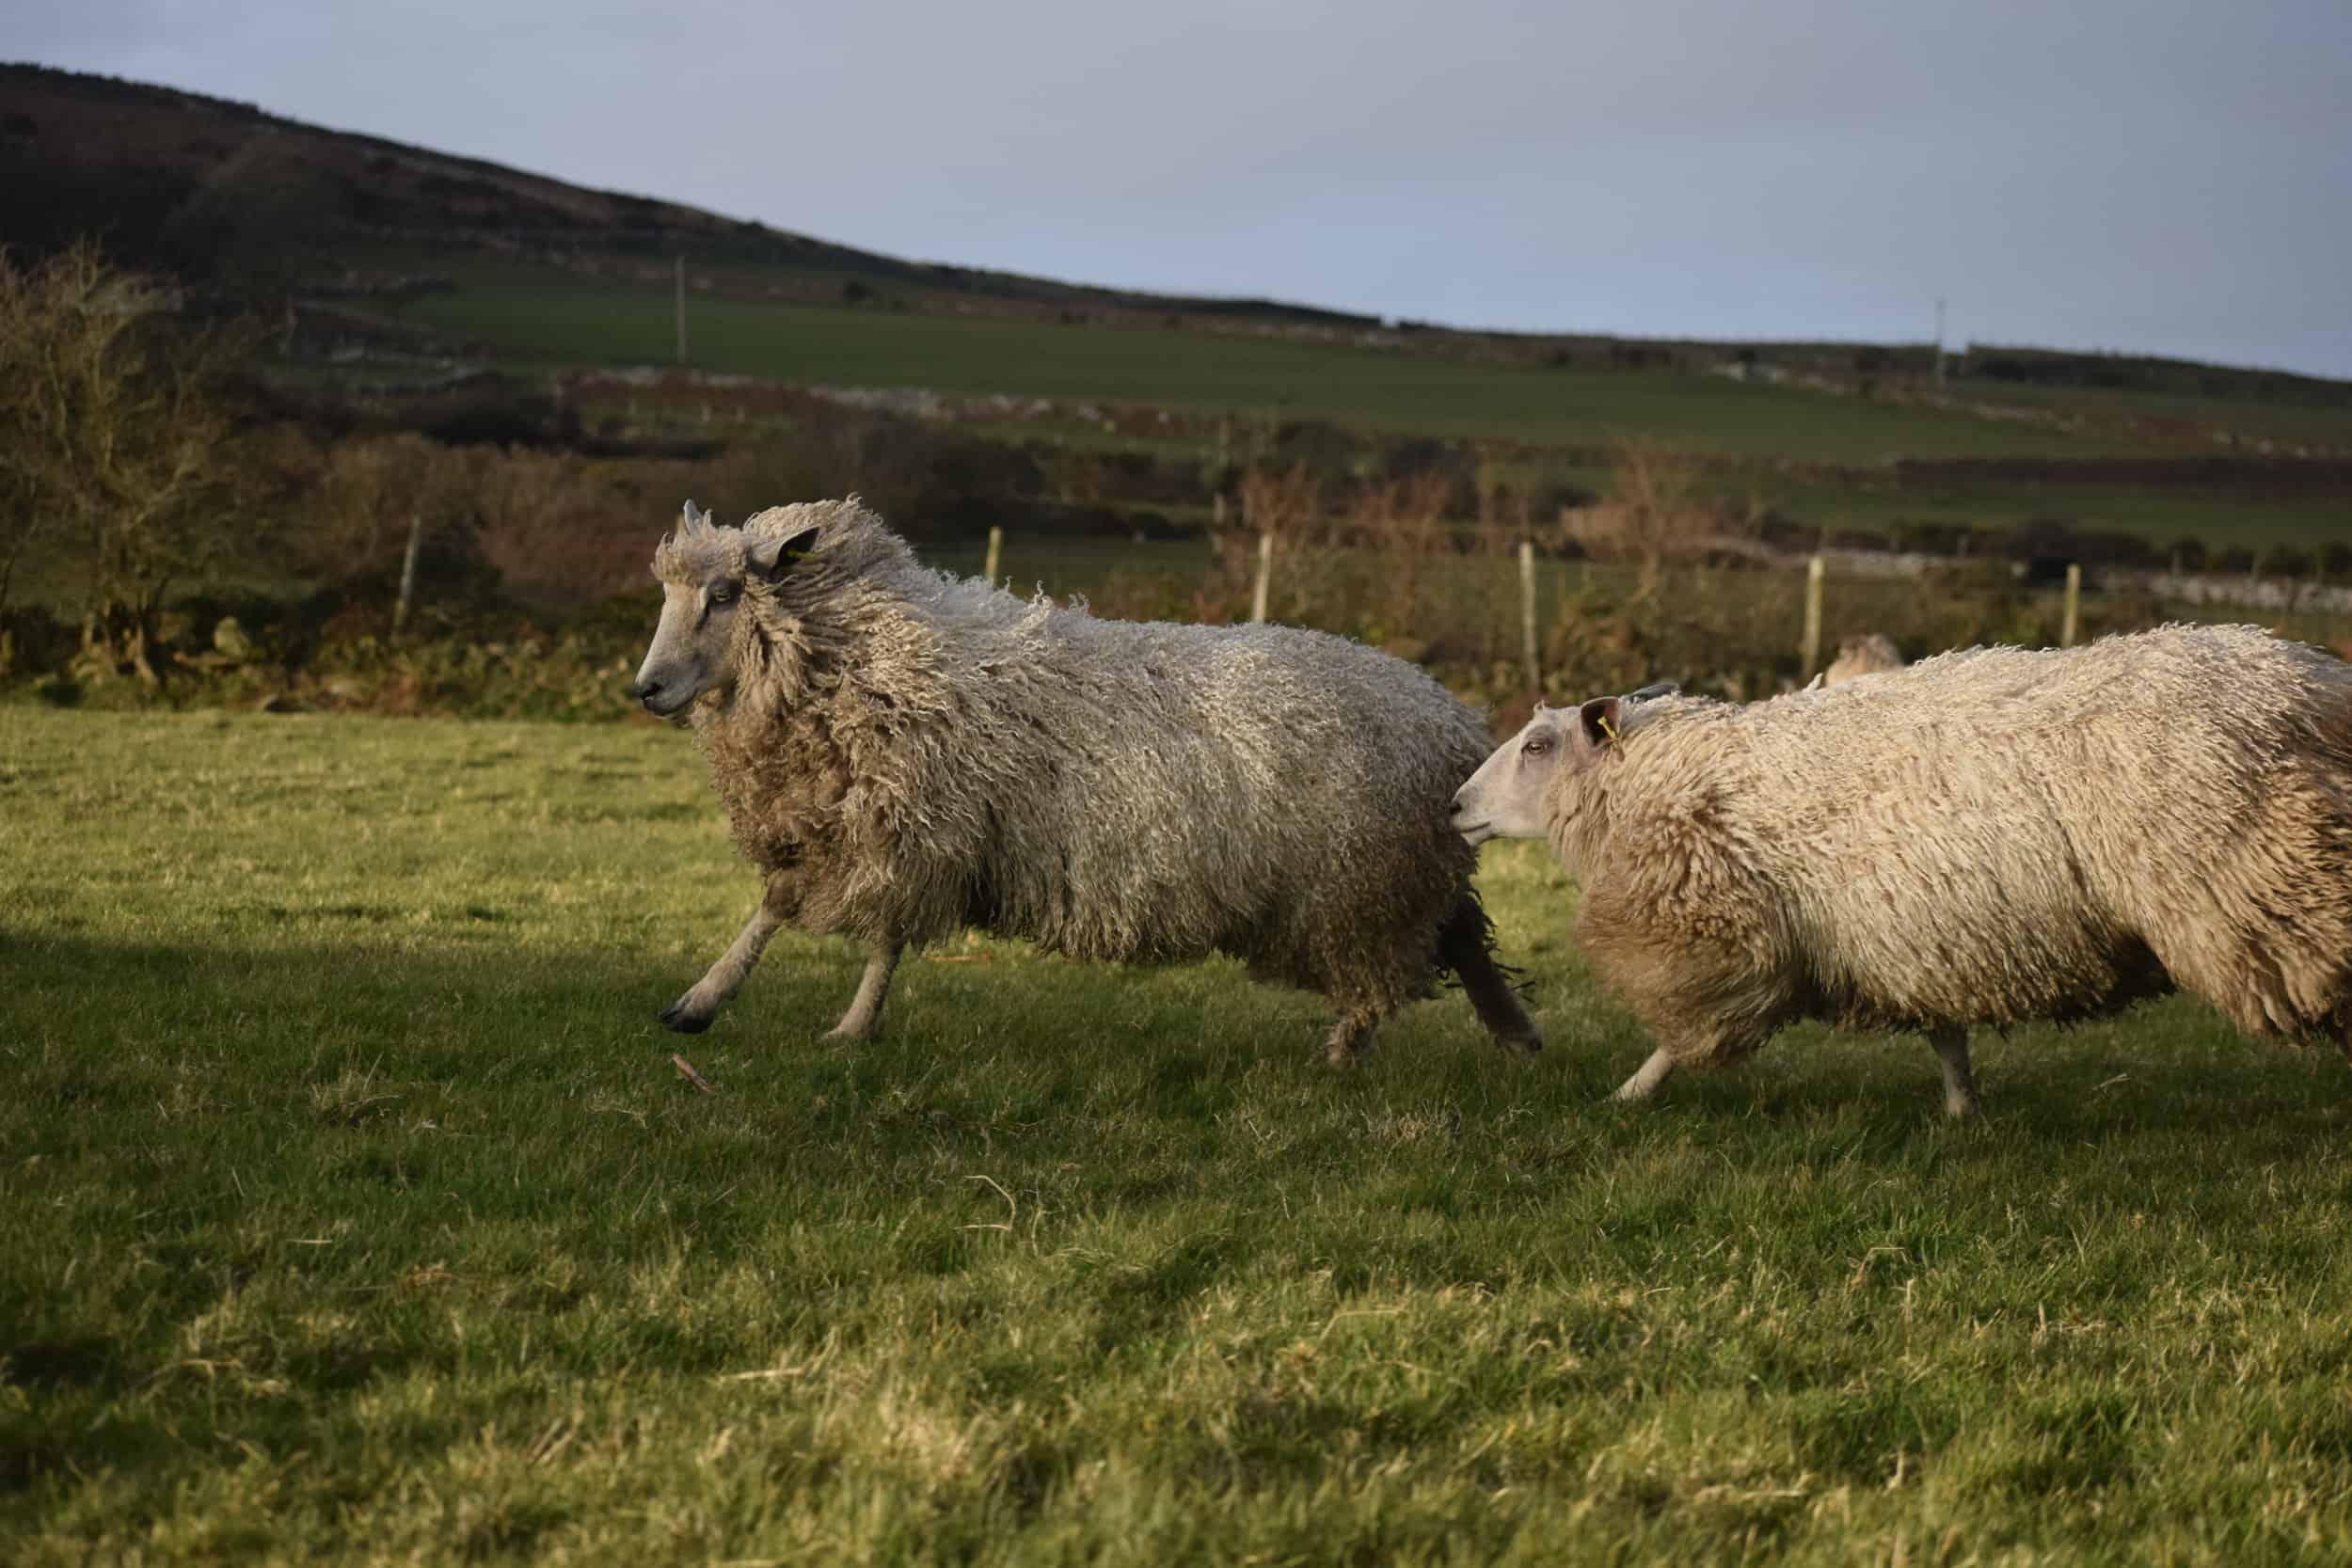 luna texel x wensleydale patchwork sheep wool 6